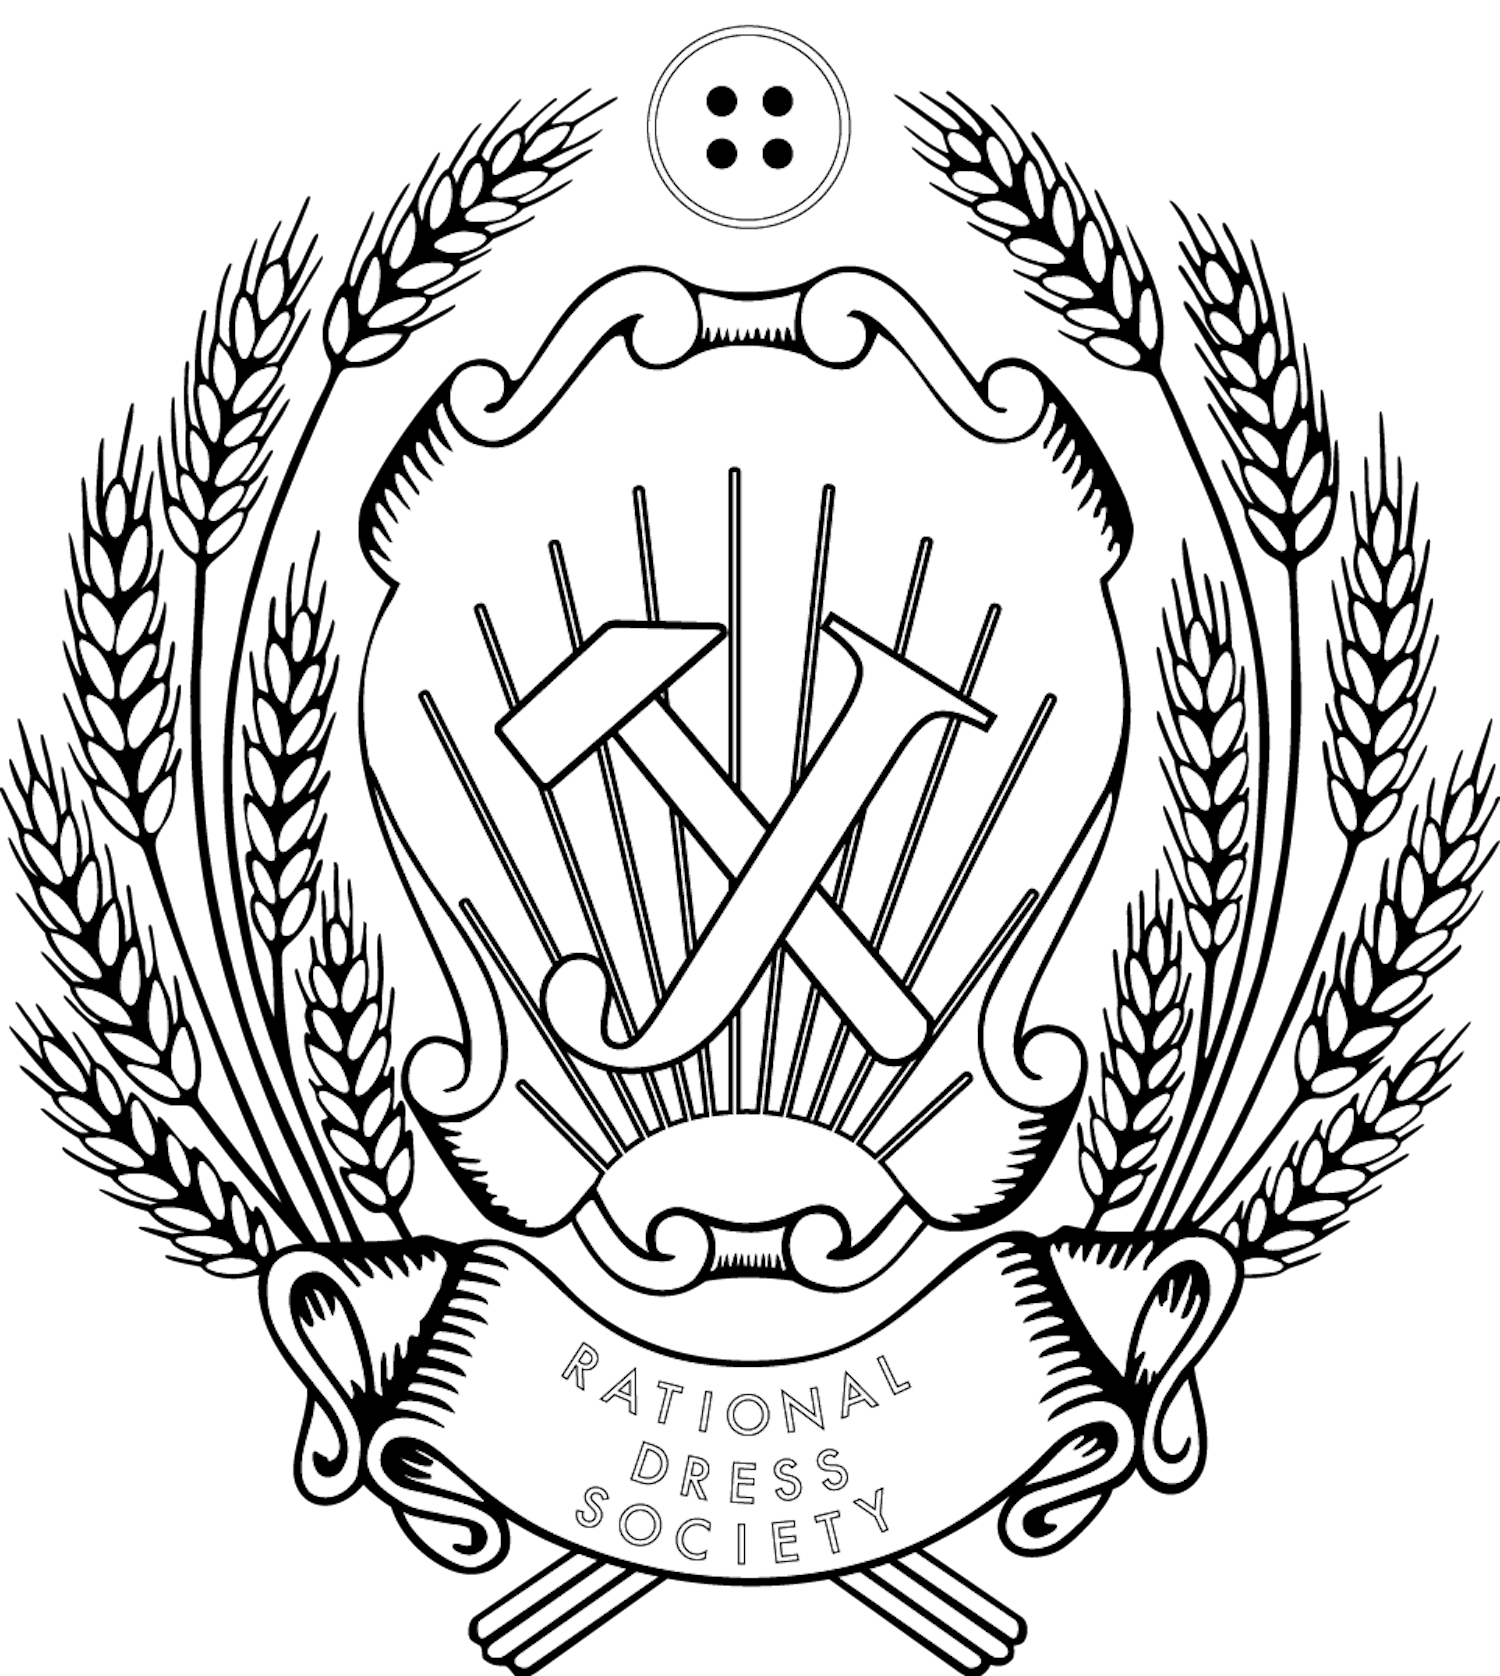 Heraldic-in-black-on-white.png